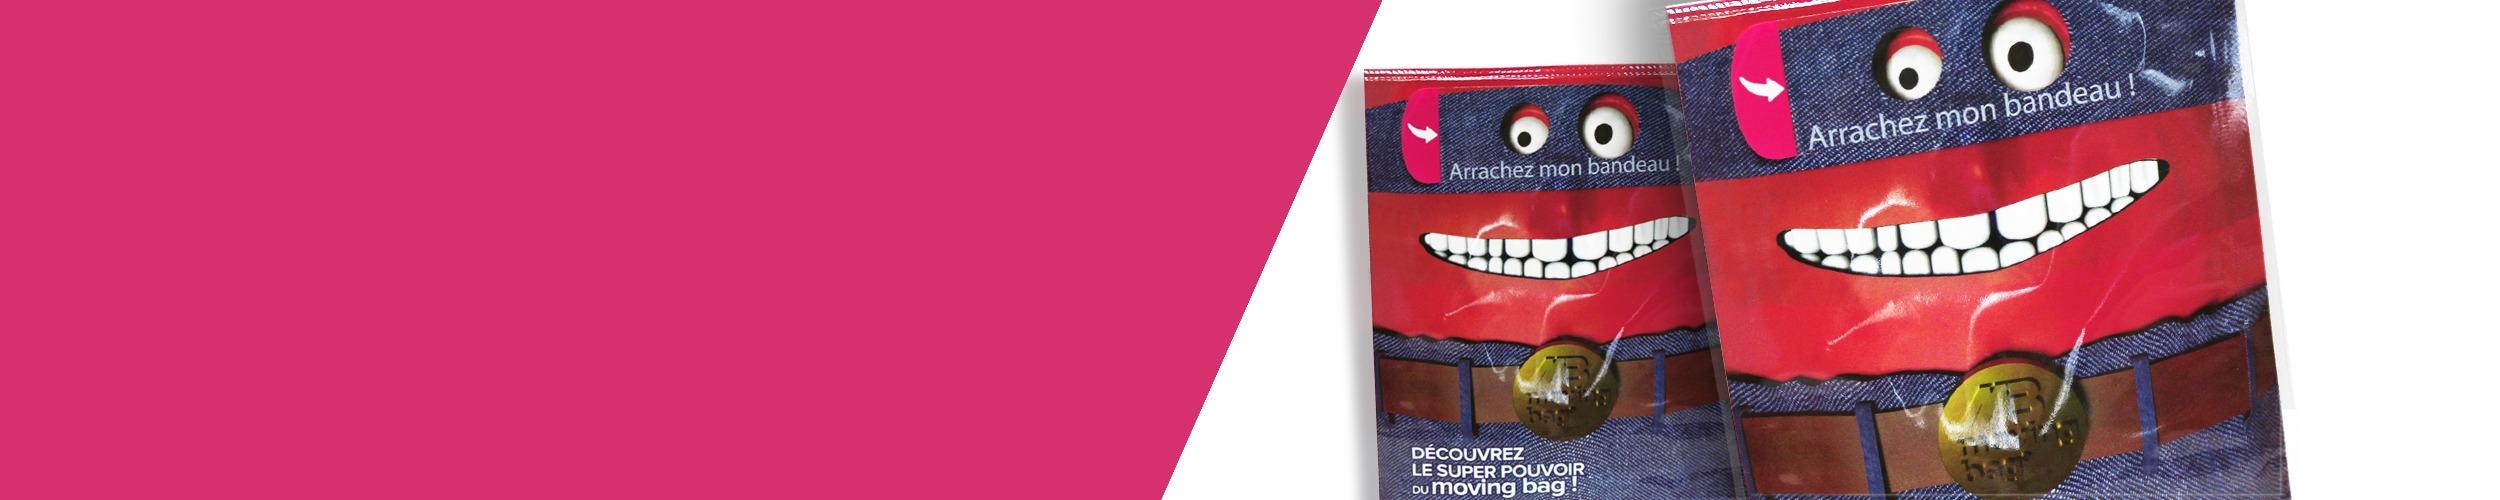 étiquette emballage alimentaire ouverture facile, Up'n Bag, Etik Ouest packaging